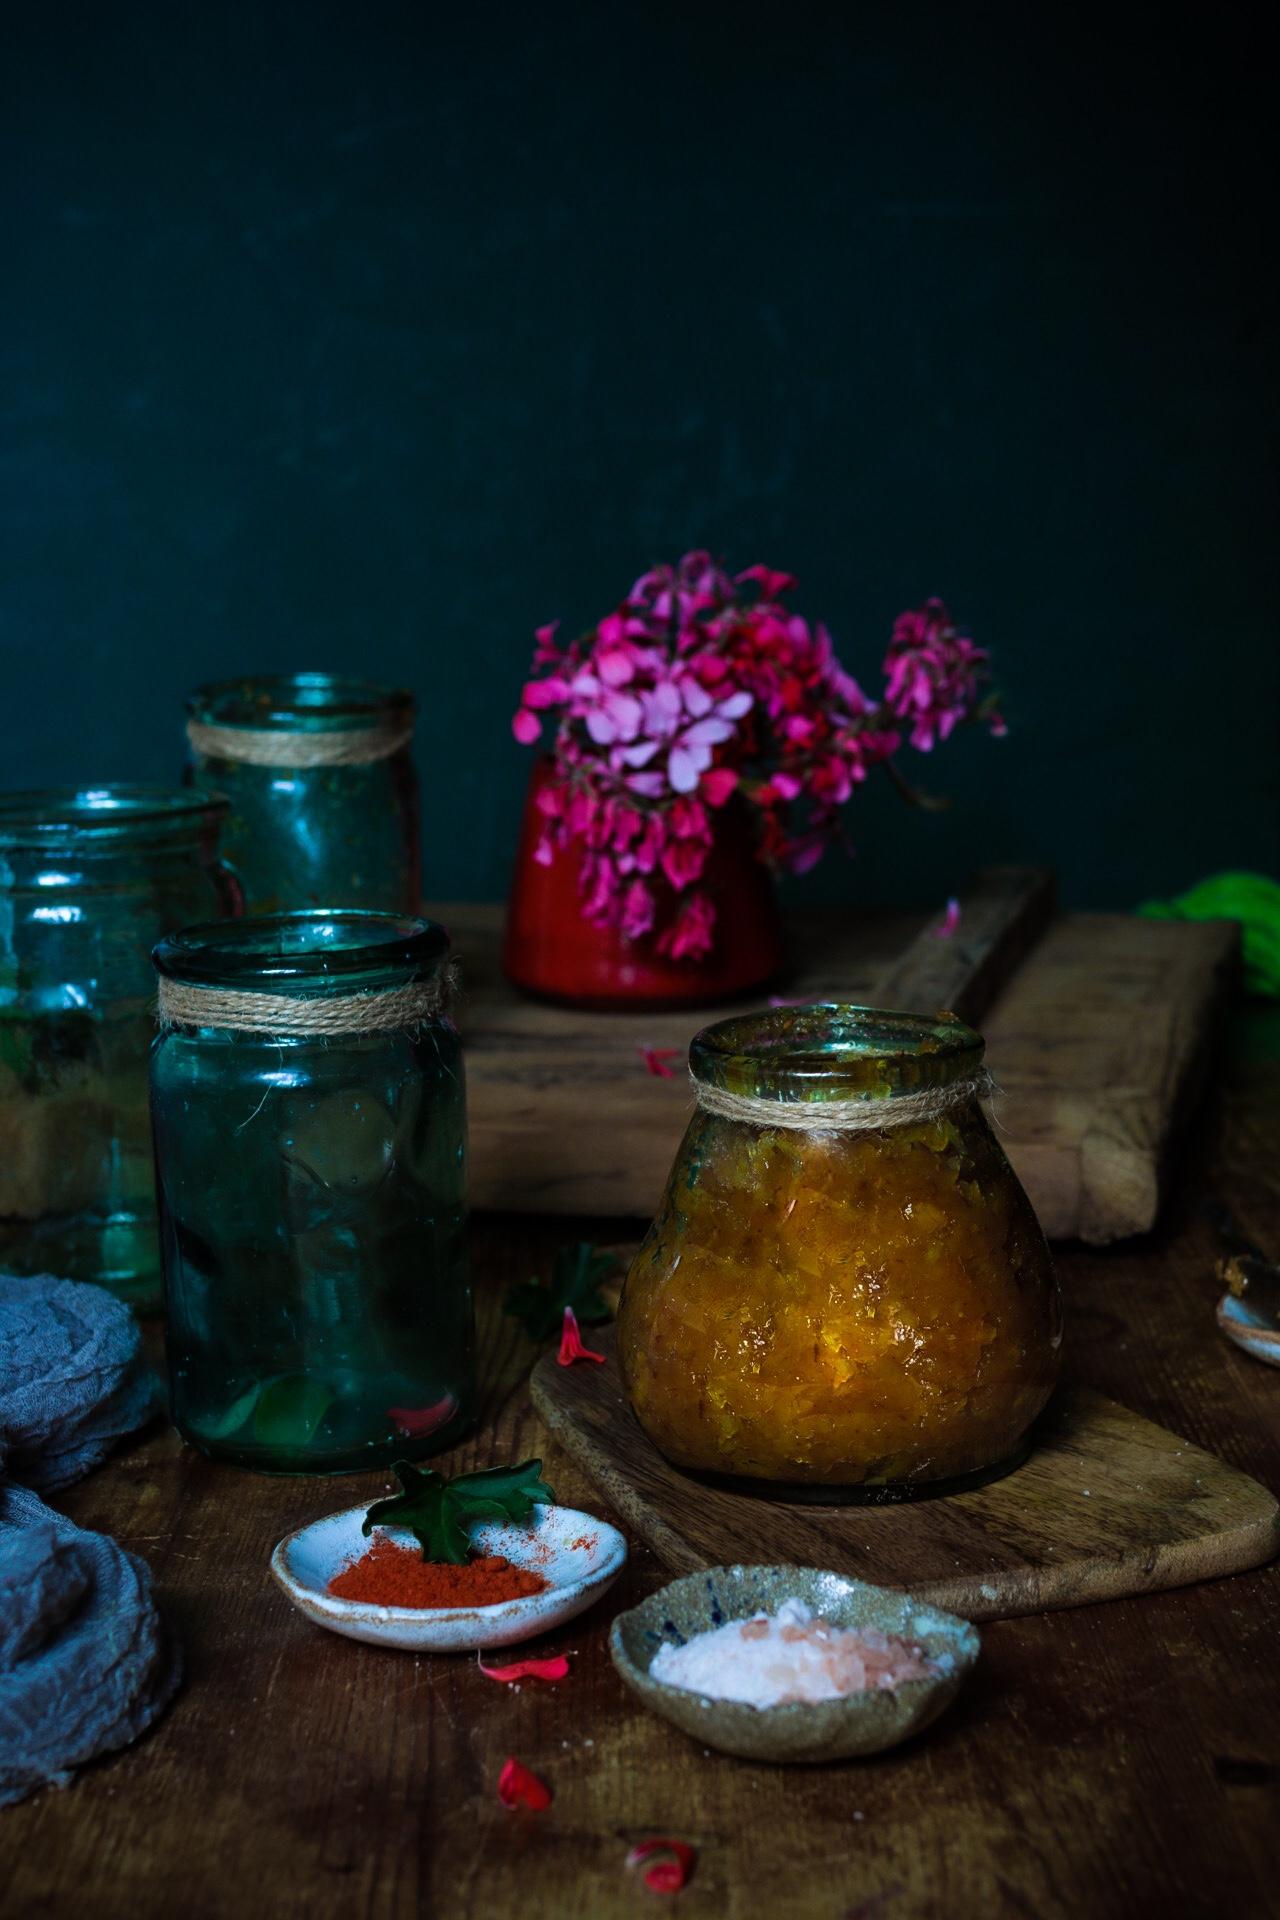 Recipe for mango chutney